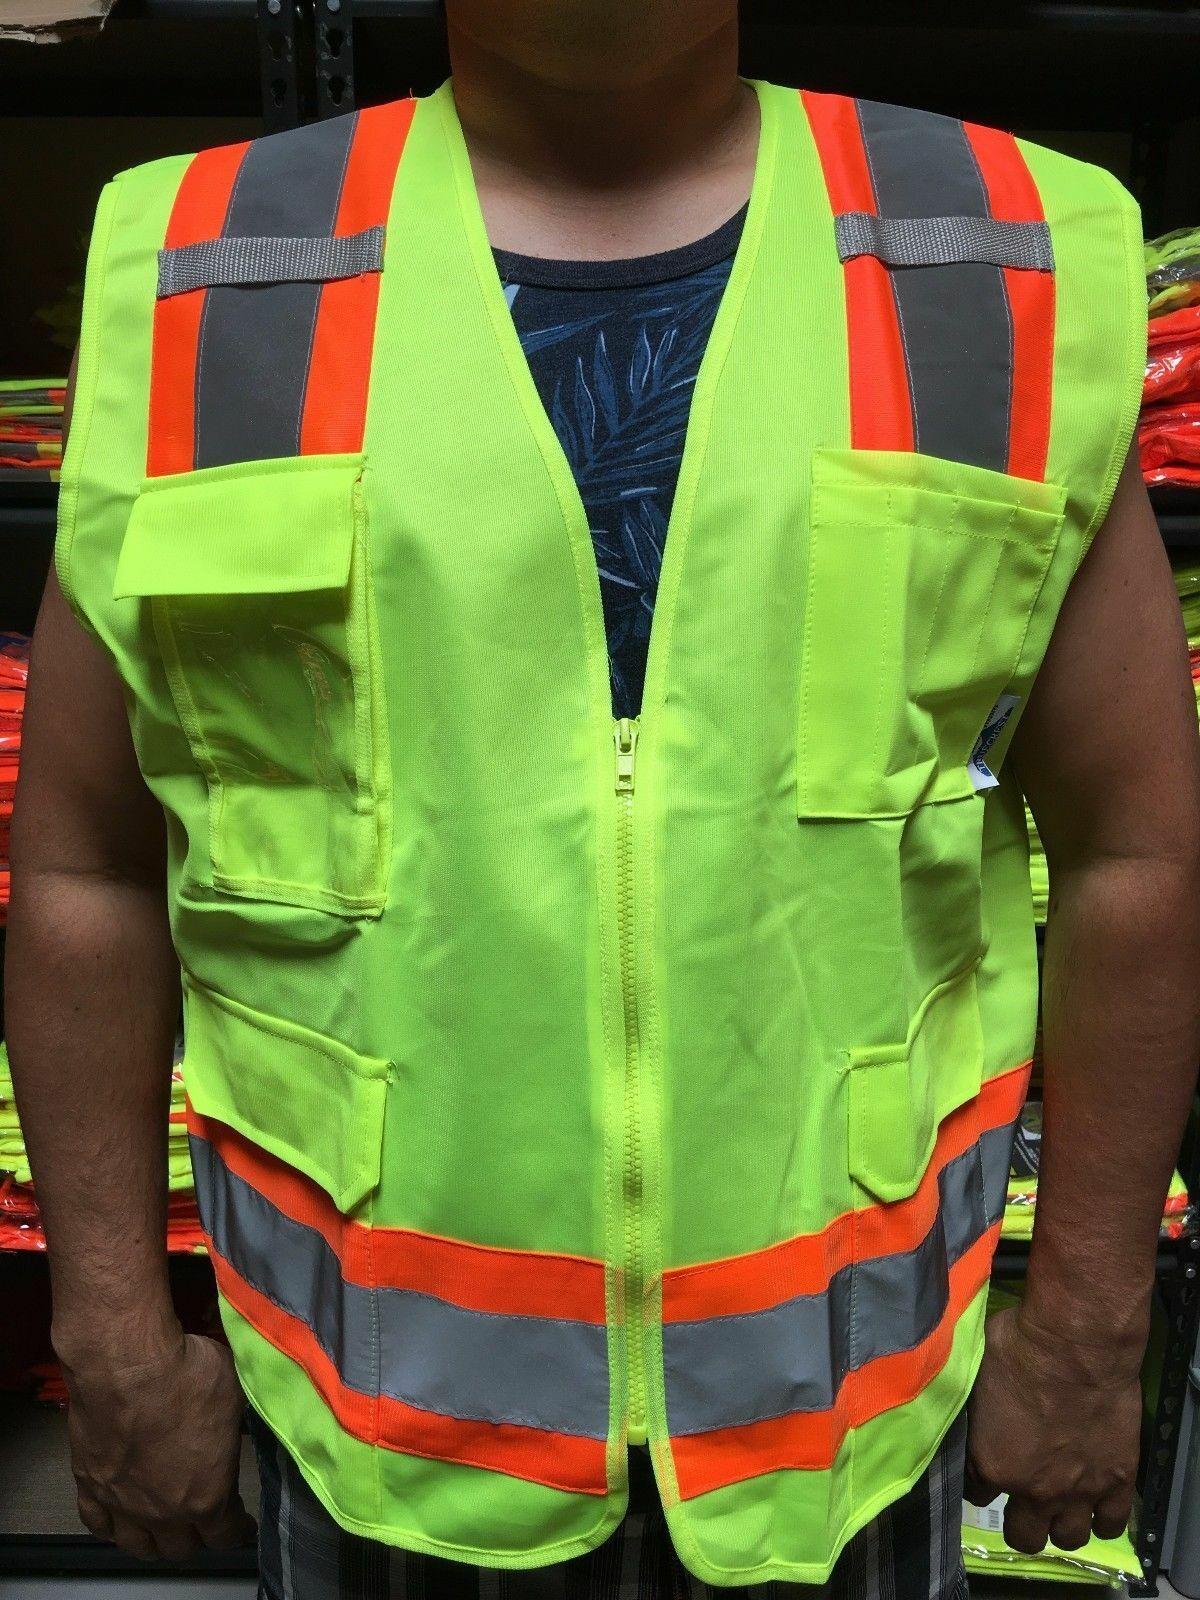 Surveyor Solid Lime Two Tones Safety Vest , ANSI/ ISEA 107-2